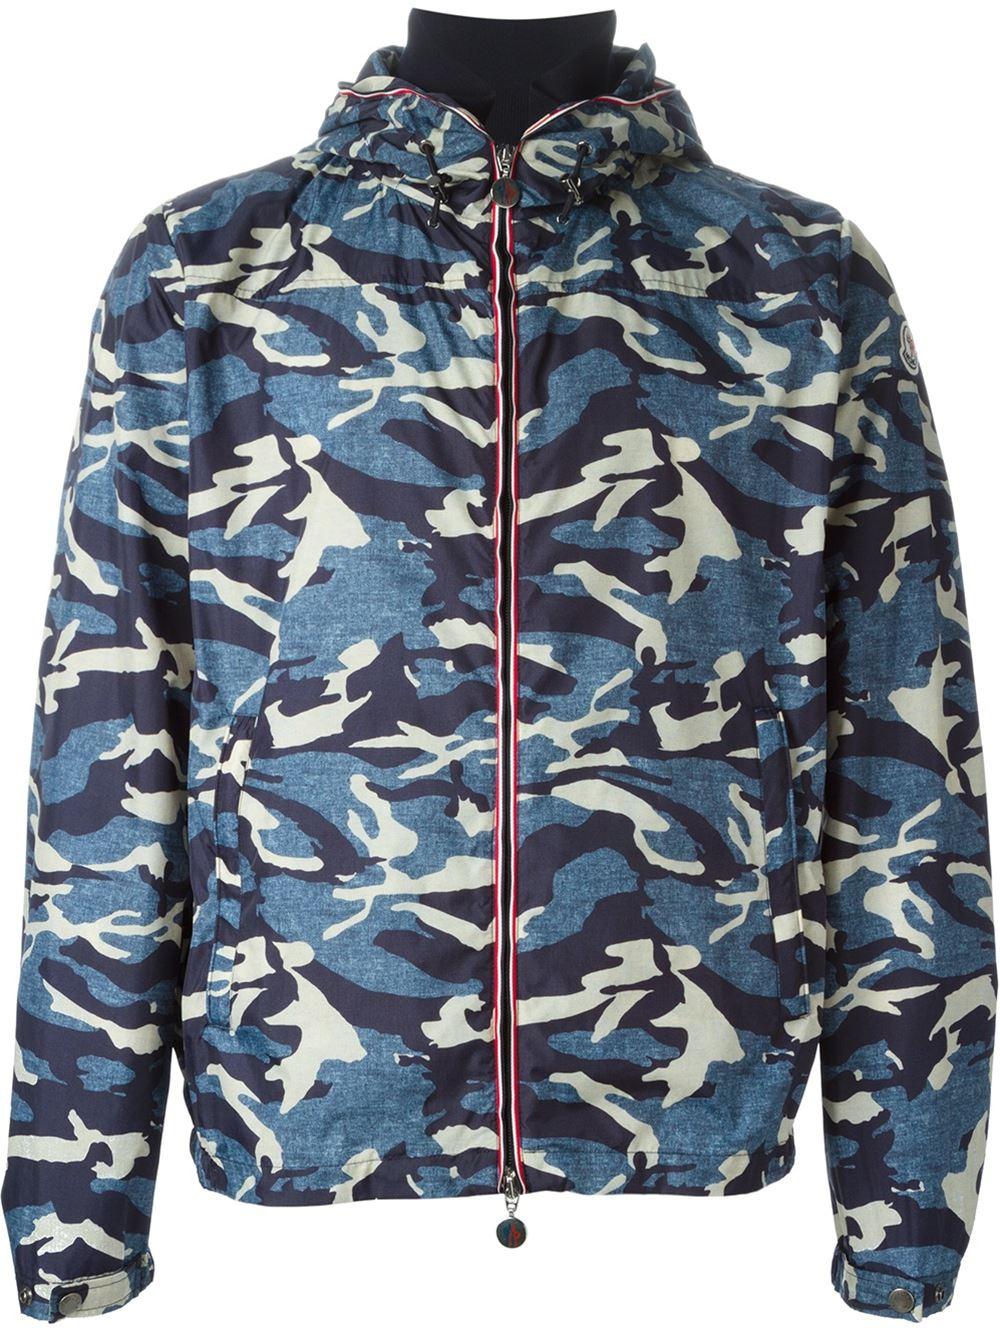 Moncler Camo Jacket Mens